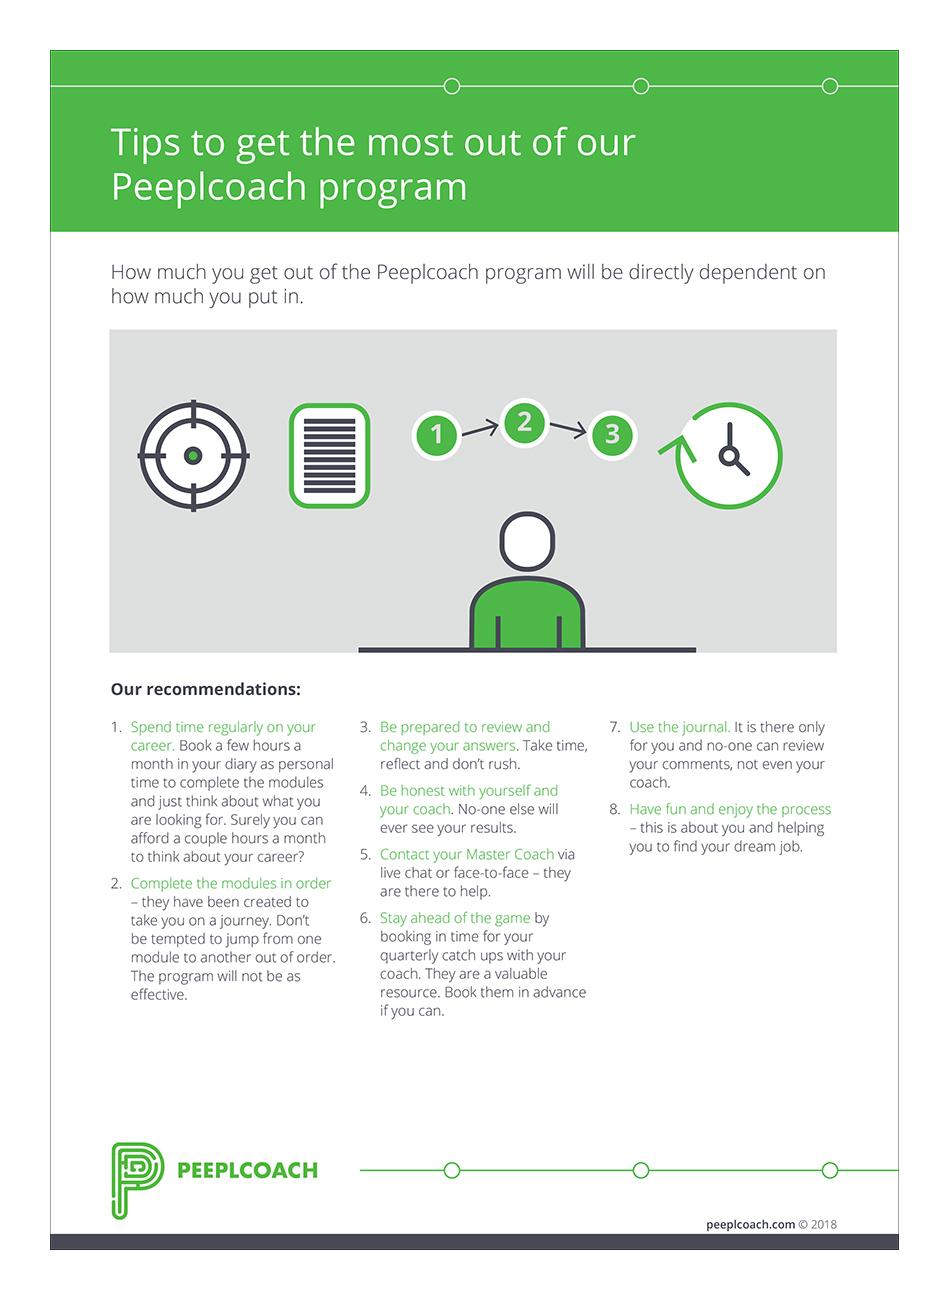 Peeplcoach-information-sheets-graphic-design-3.jpg